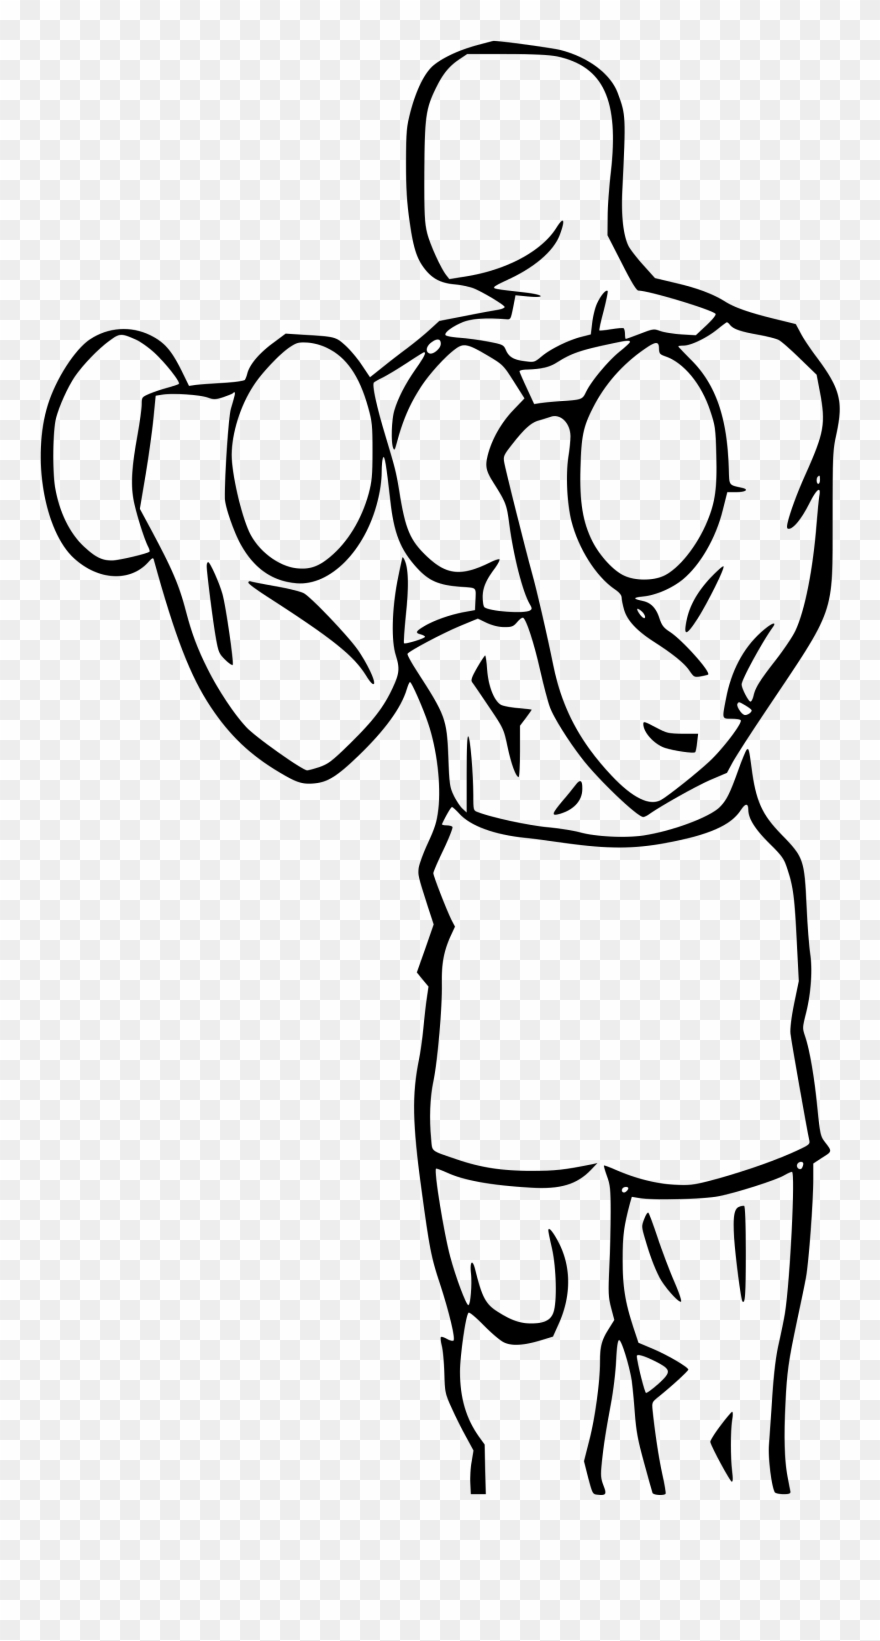 png royalty free download Biceps cartoon clip art. Bicep drawing animated